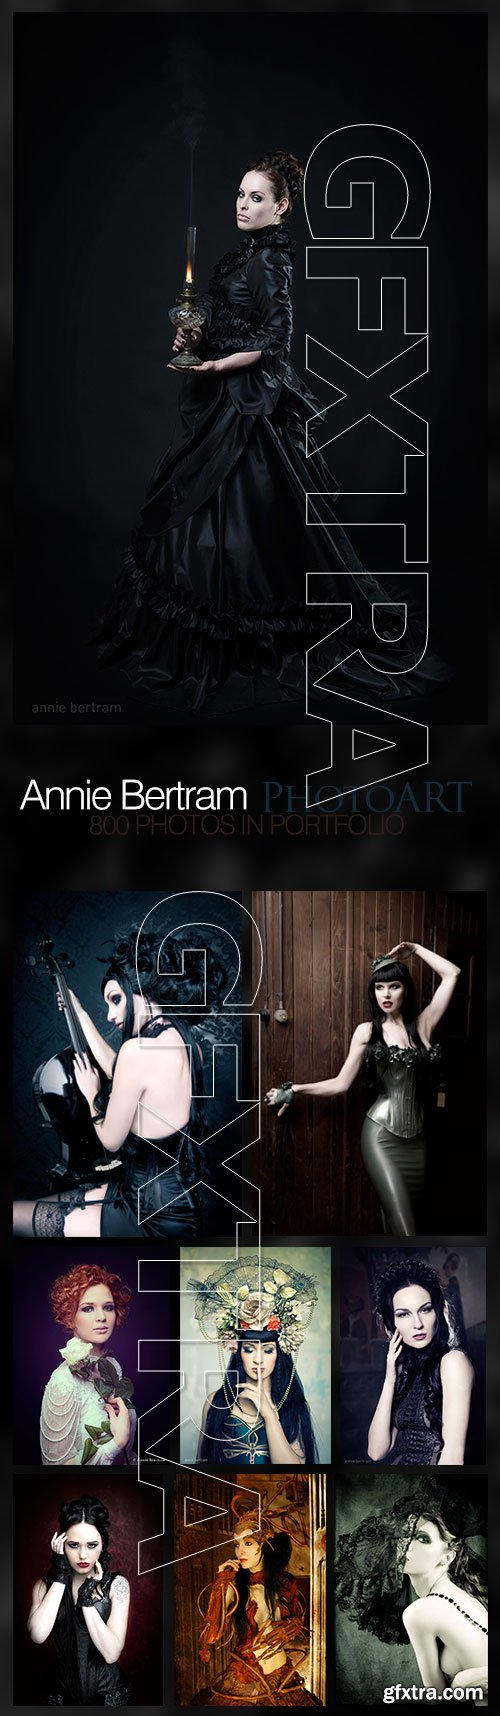 Annie Bertram PhotoArt Portfolio 800xJPG